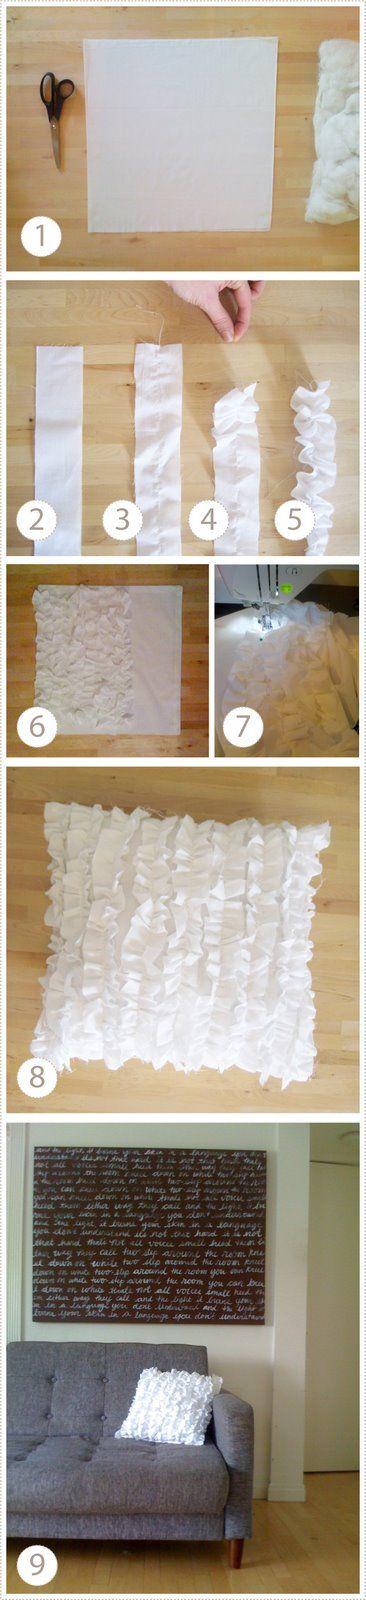 DIY ruffle pillows. I can So make this!